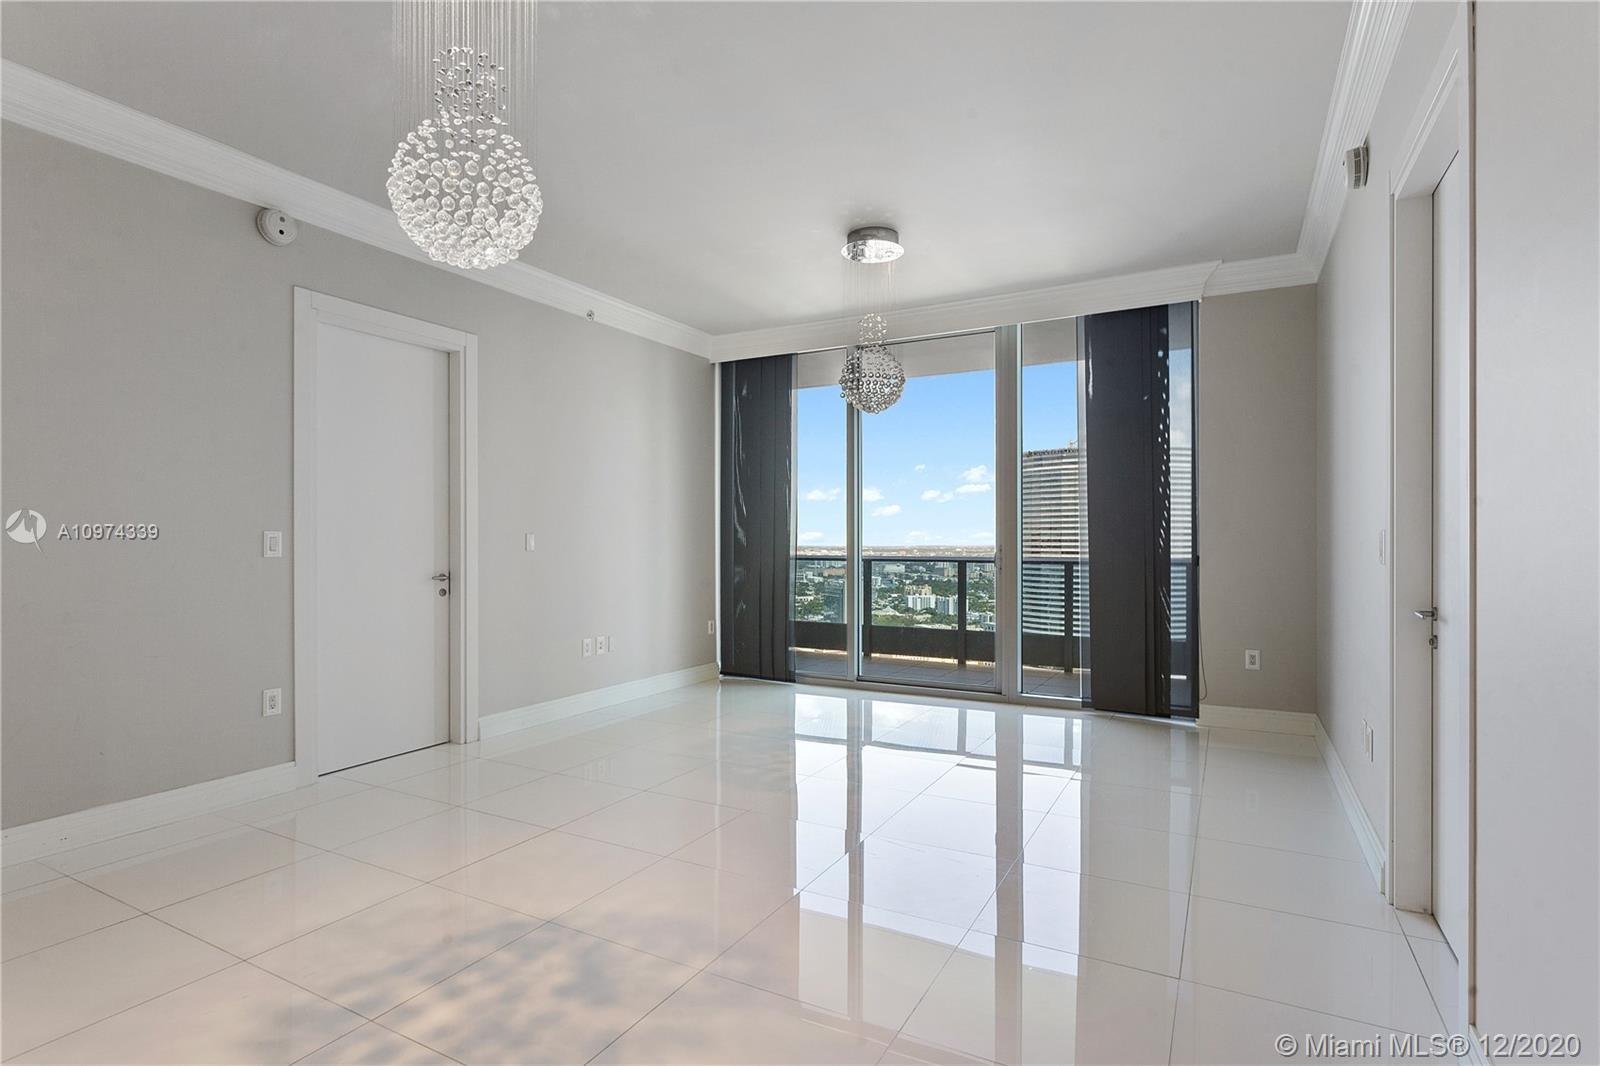 Epic Residences #5009 - 200 Biscayne Boulevard Way #5009, Miami, FL 33131